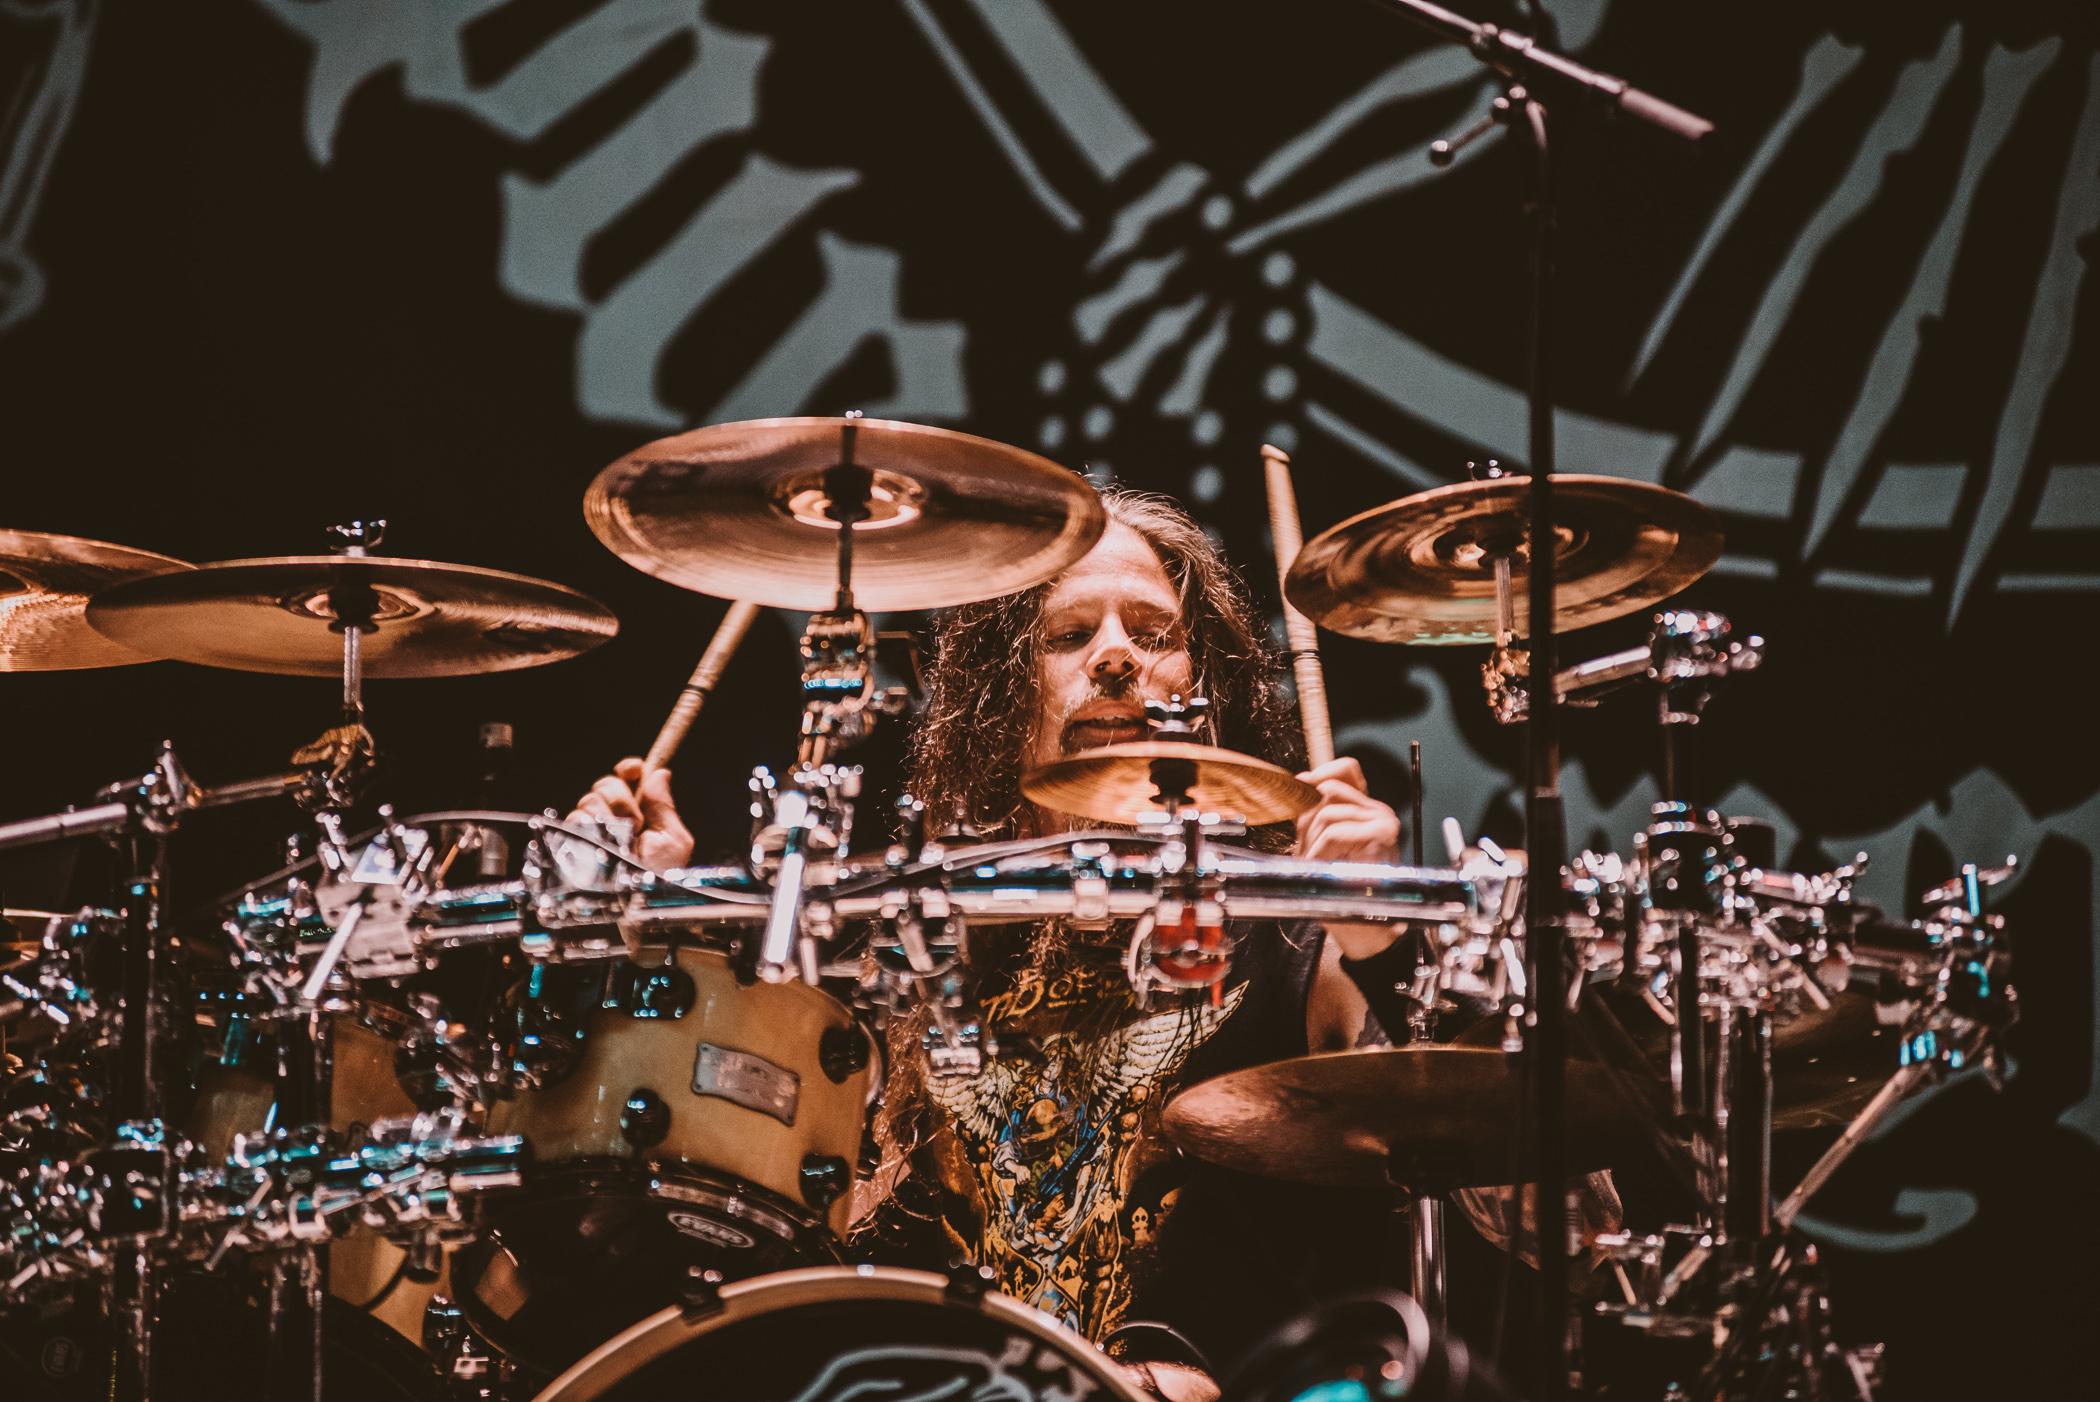 1_Lamb_Of_God-Pacific_Coliseum-Vancouver-Timothy_Nguyen-20180516 (38 of 47).jpg